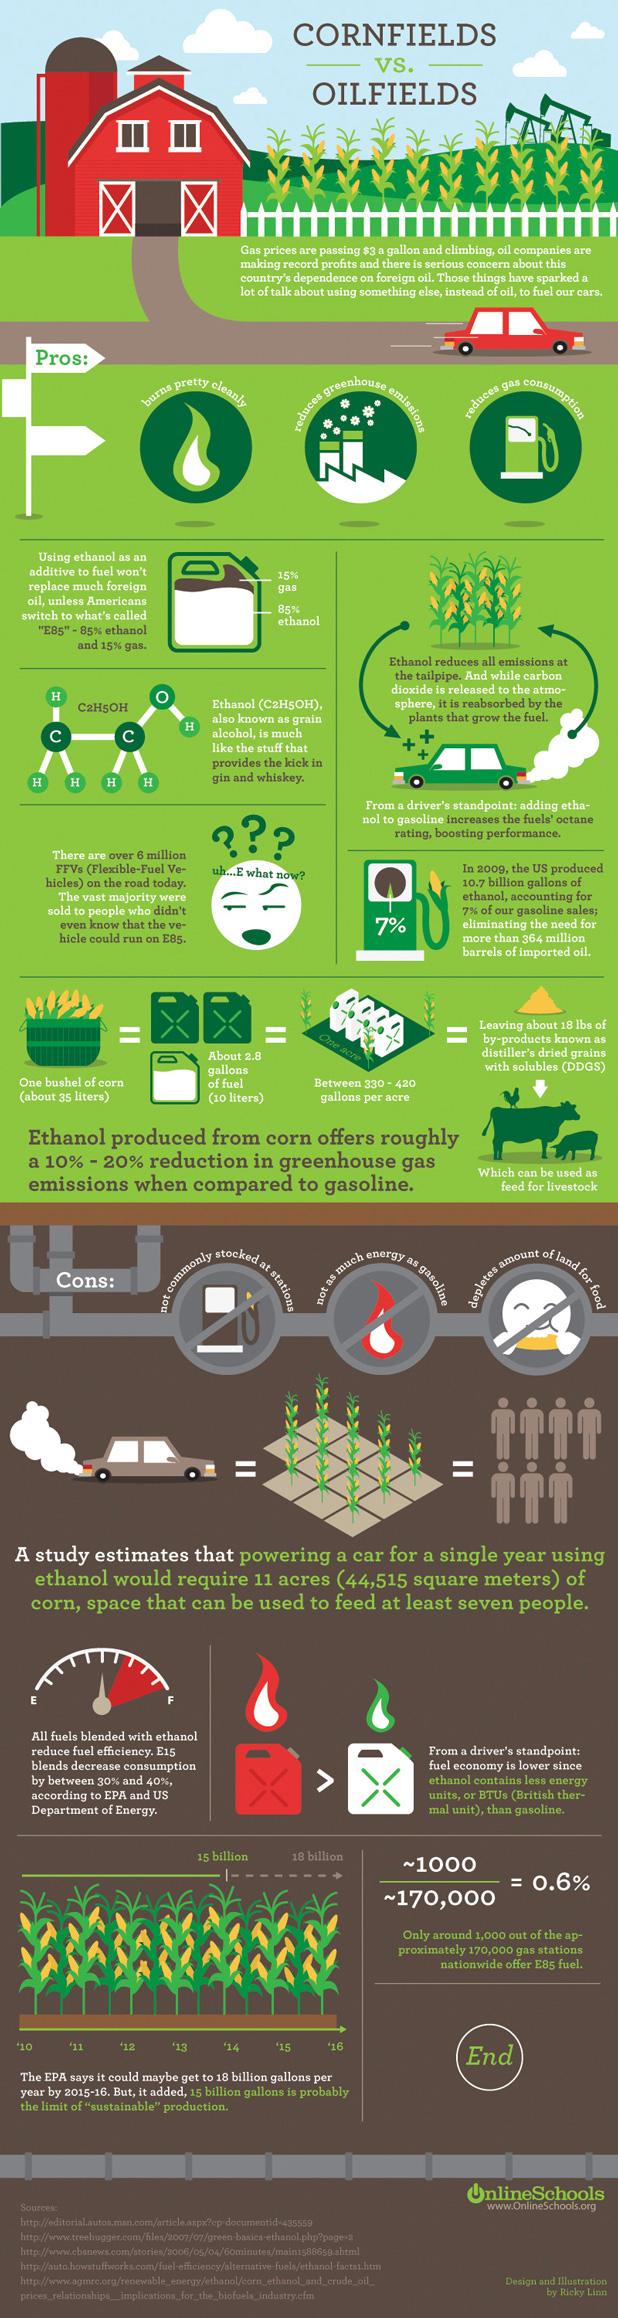 La eficiencia energética del bioetanol